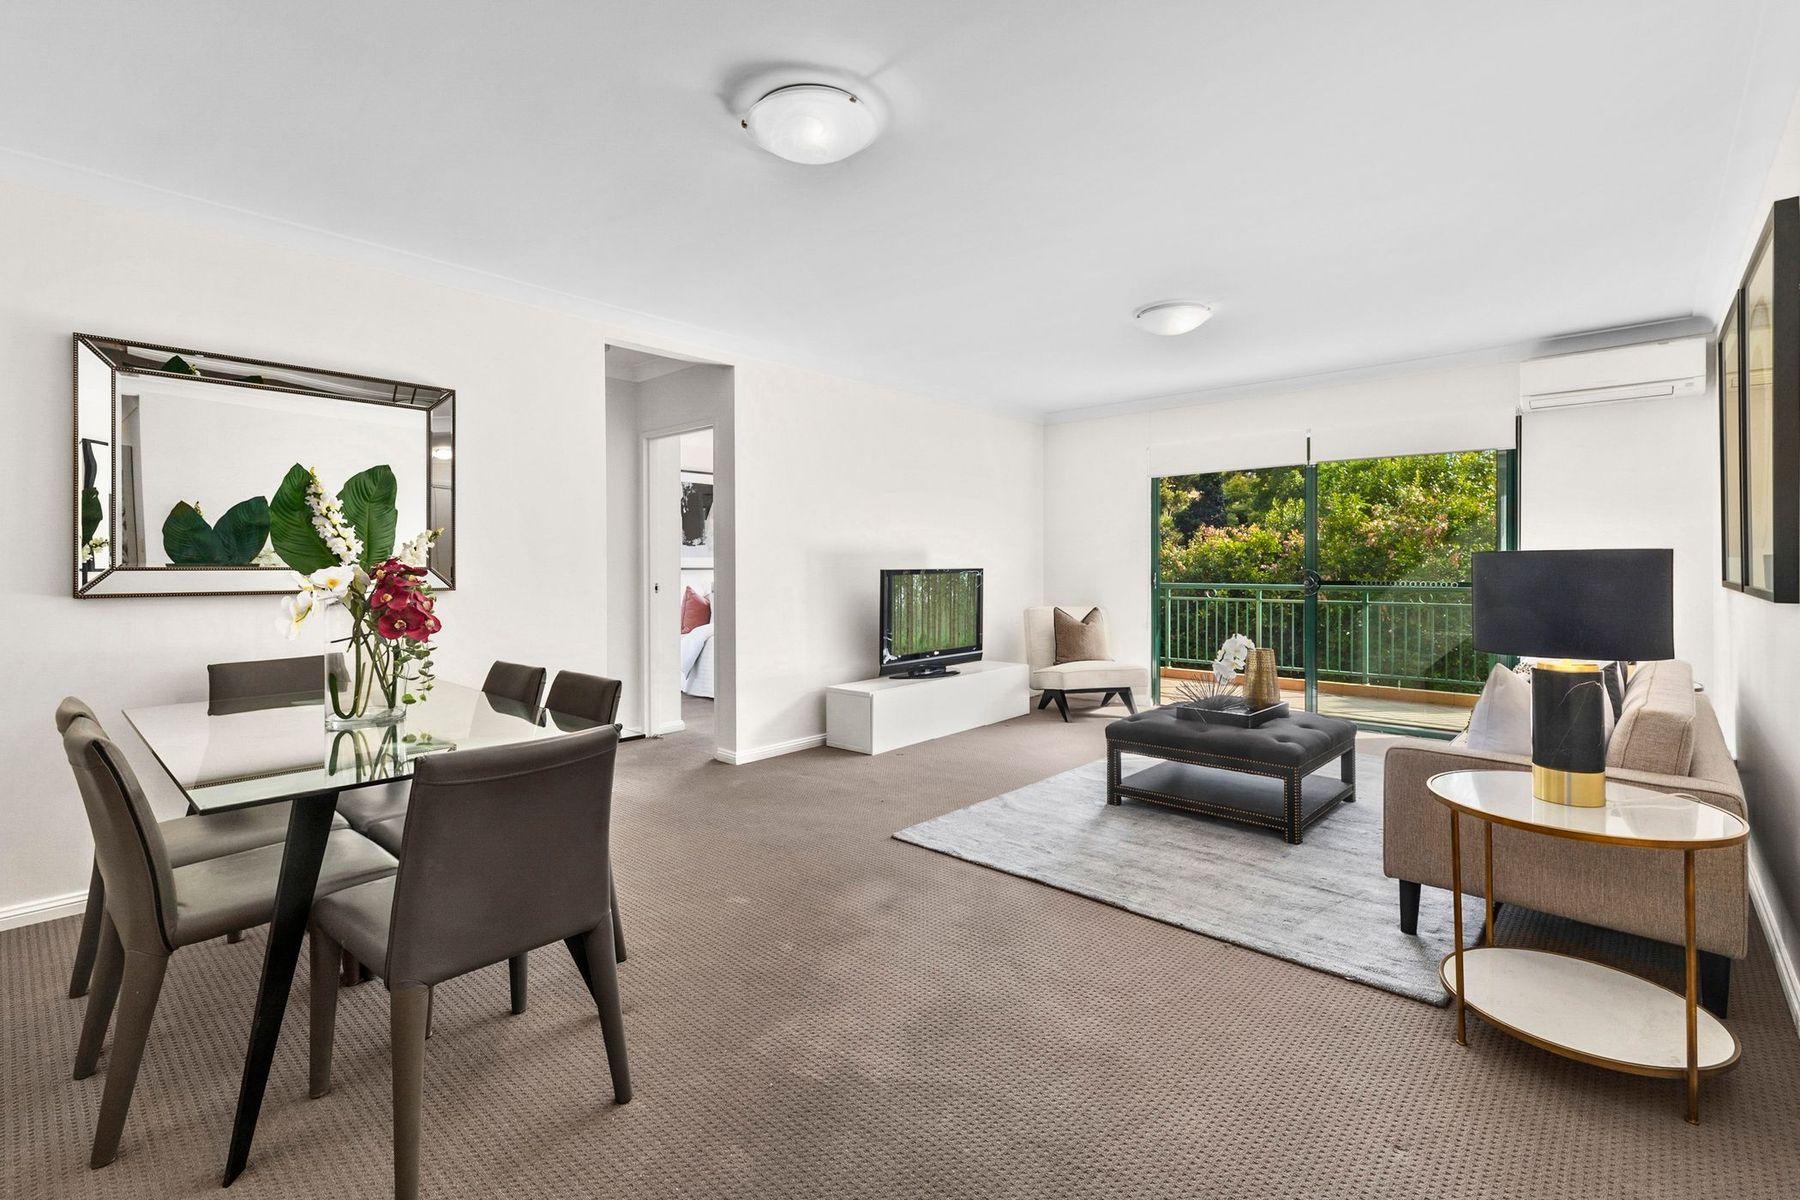 20/7 Freeman Road, Chatswood, NSW 2067